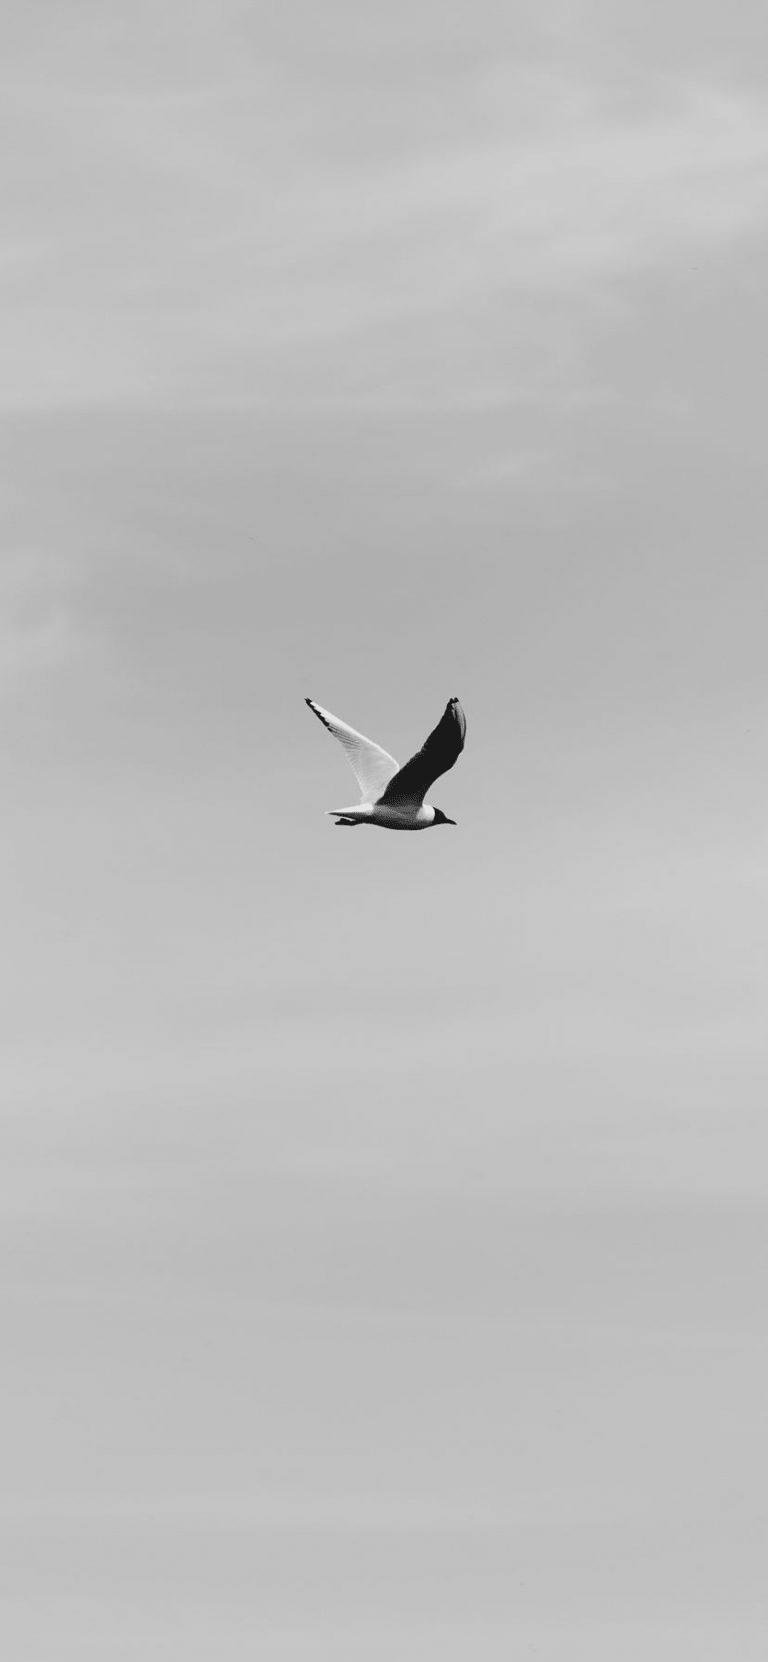 The Flight Of A Bird, calm wallpaper for iphone